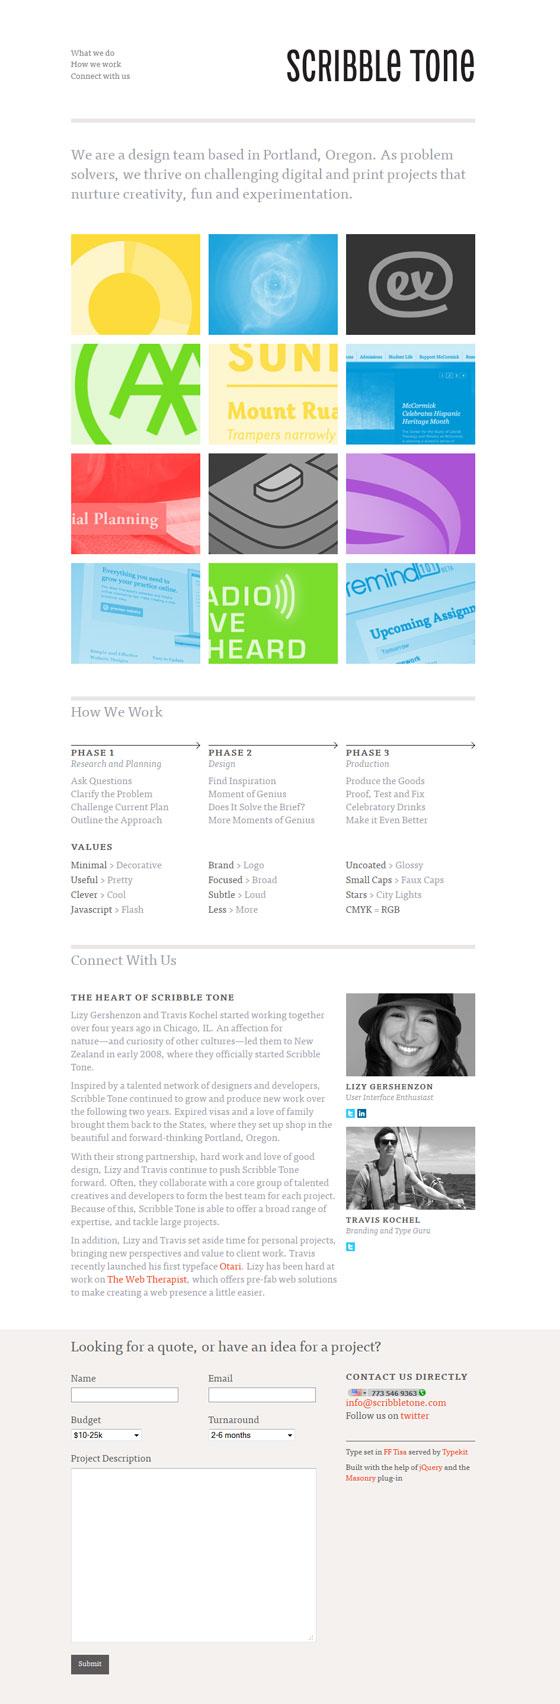 Scribble Tone | Design